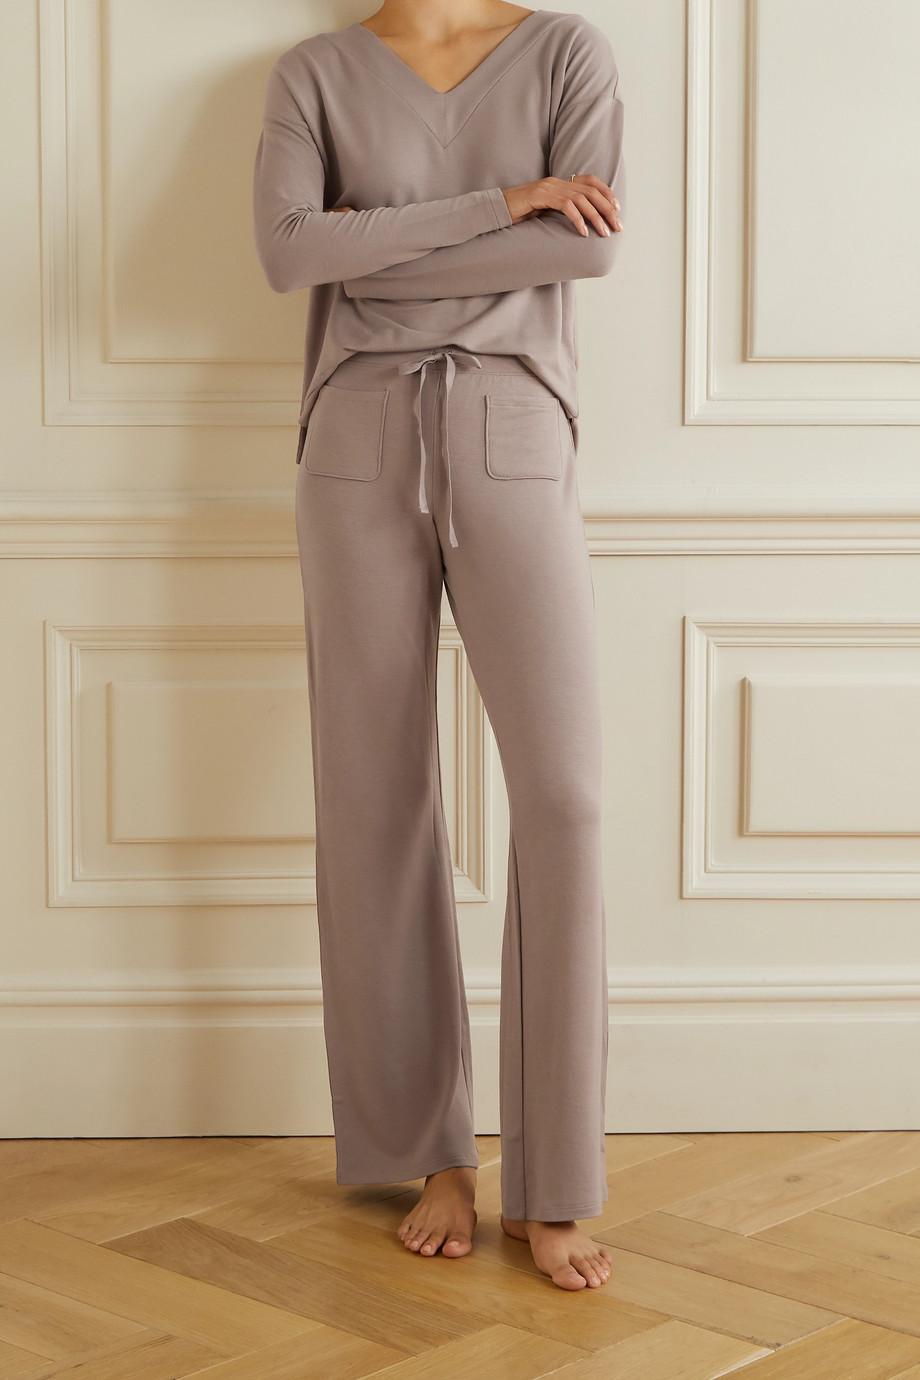 Skin Fabianna modal-blend jersey pajama pants